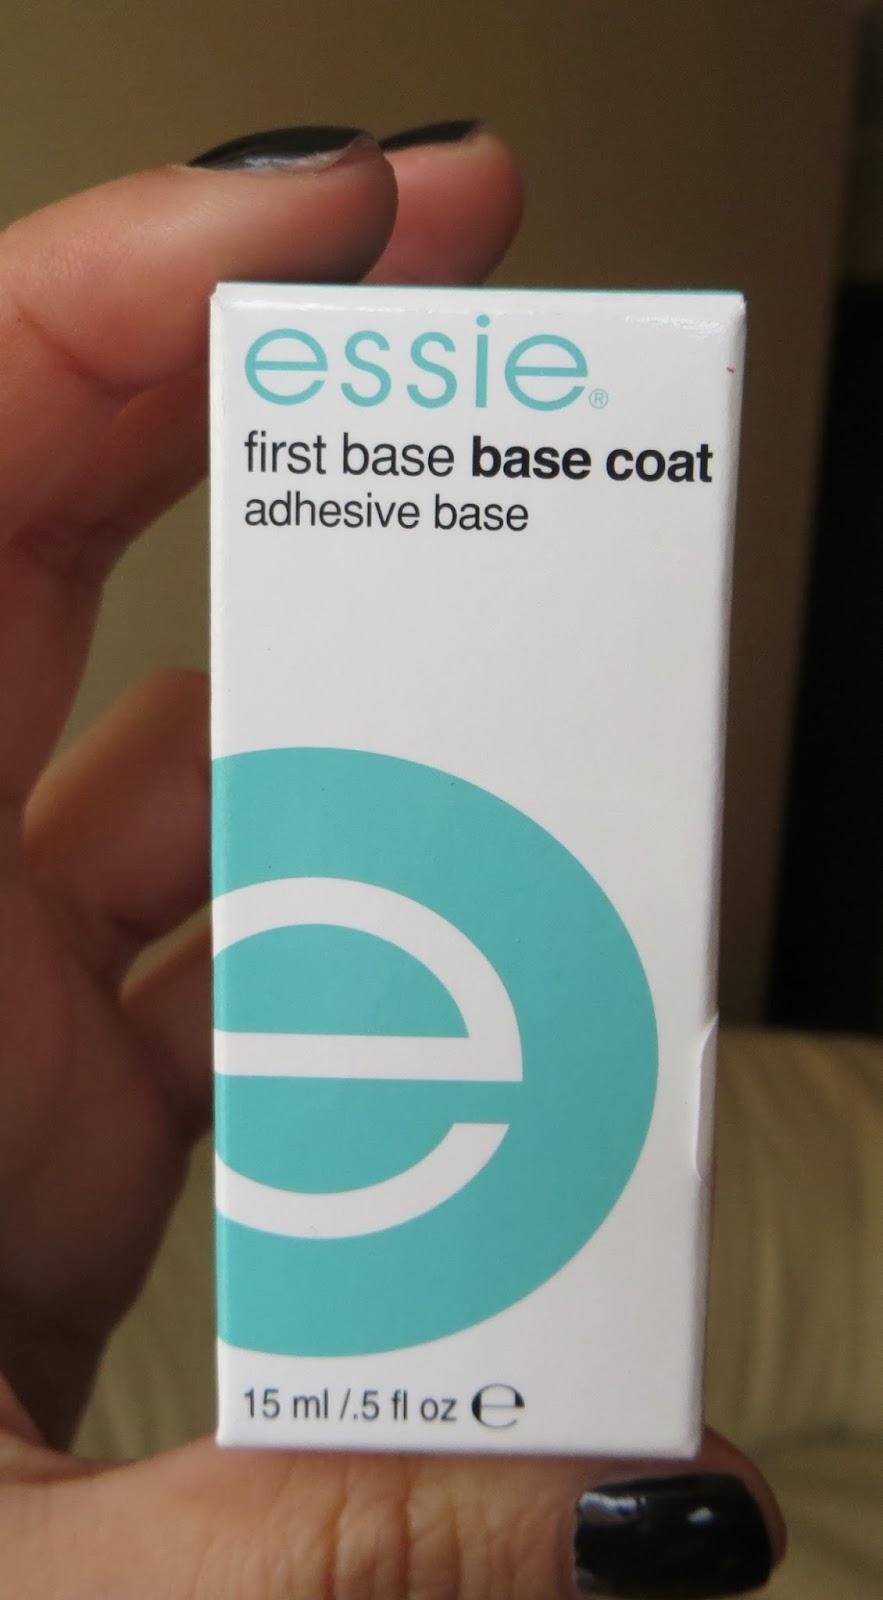 Coloreando mis Uñas: First Base Base Coat de Essie (Review)